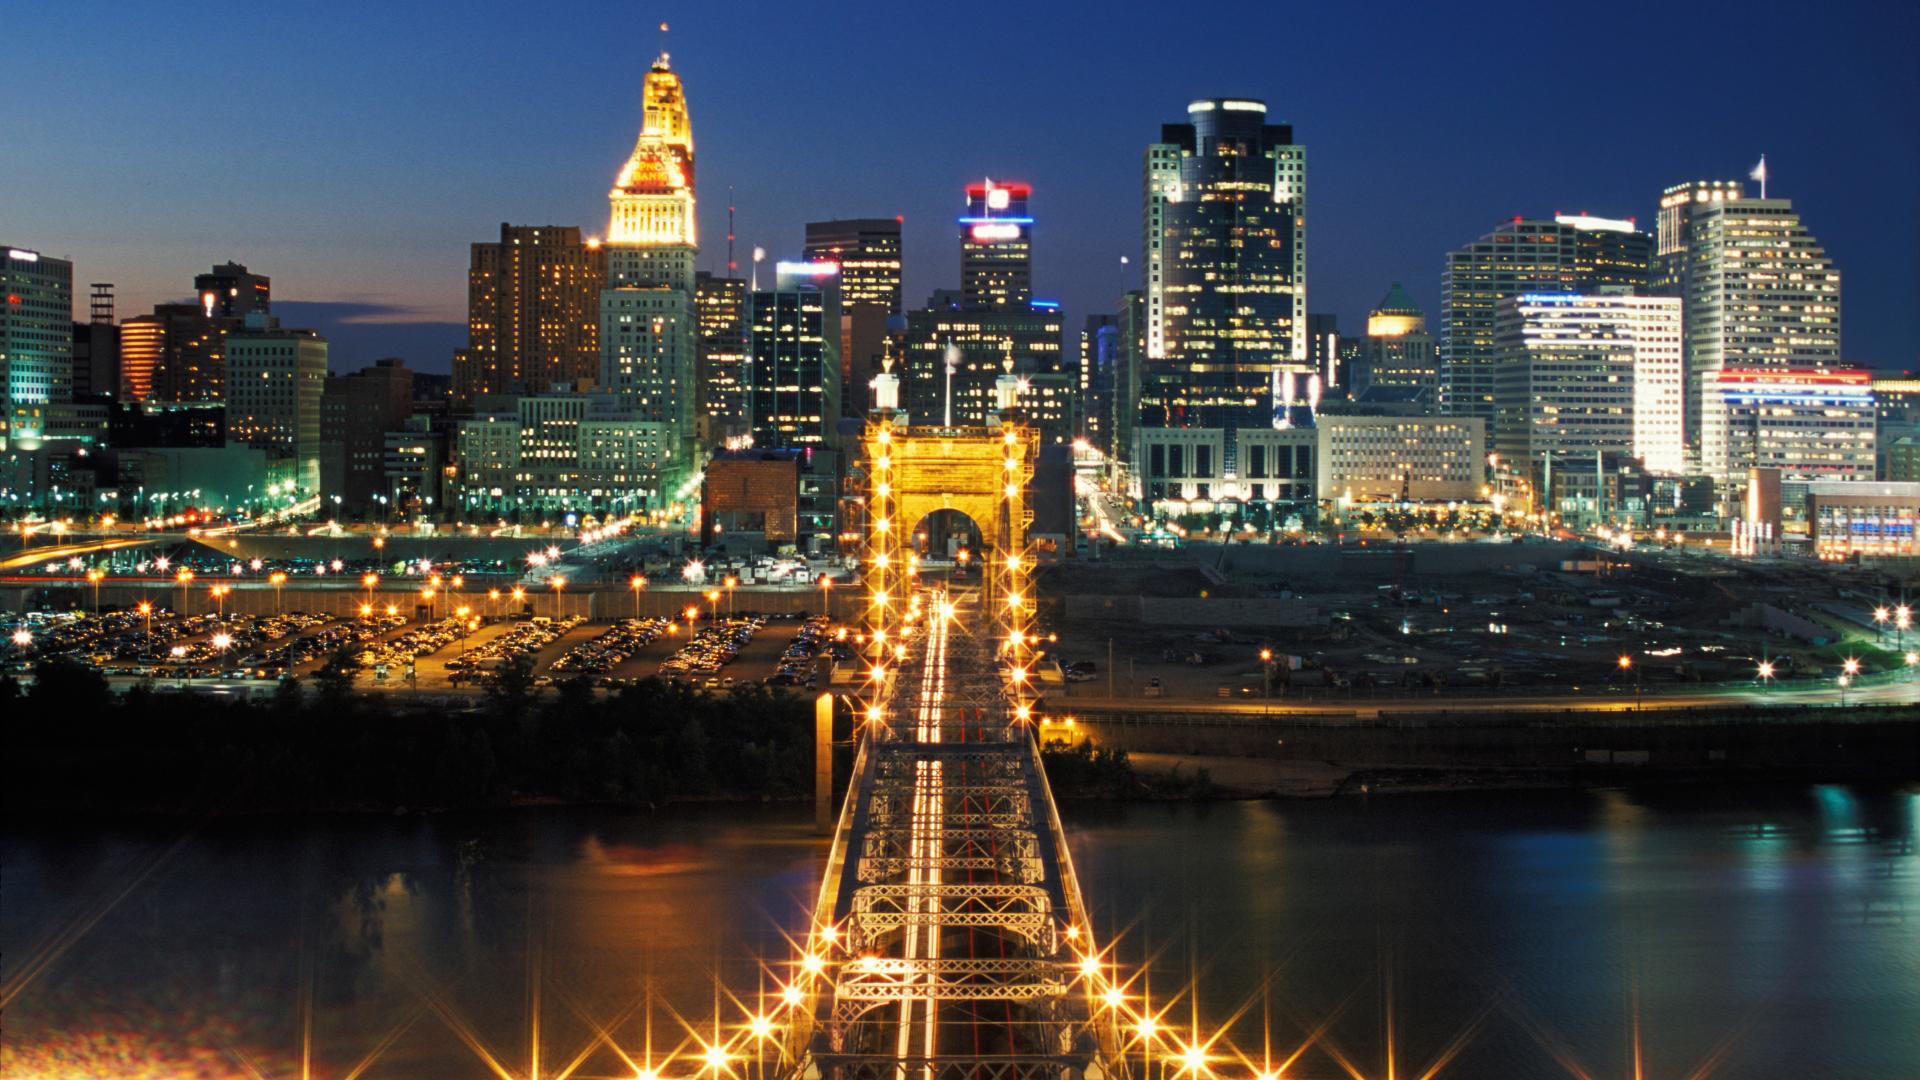 John A Roebling Suspension Bridge and Cincinnati Skyline   Travel HD Wallpaper